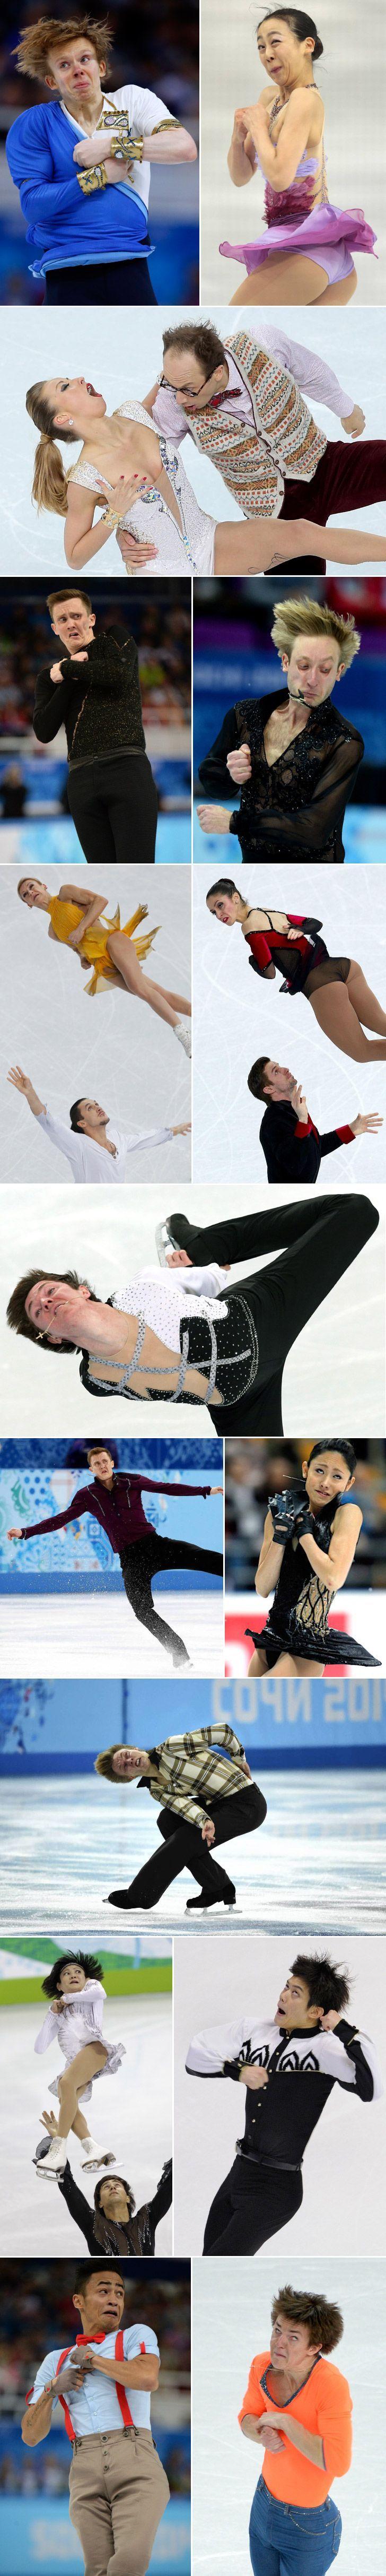 Figure skating is beautiful!